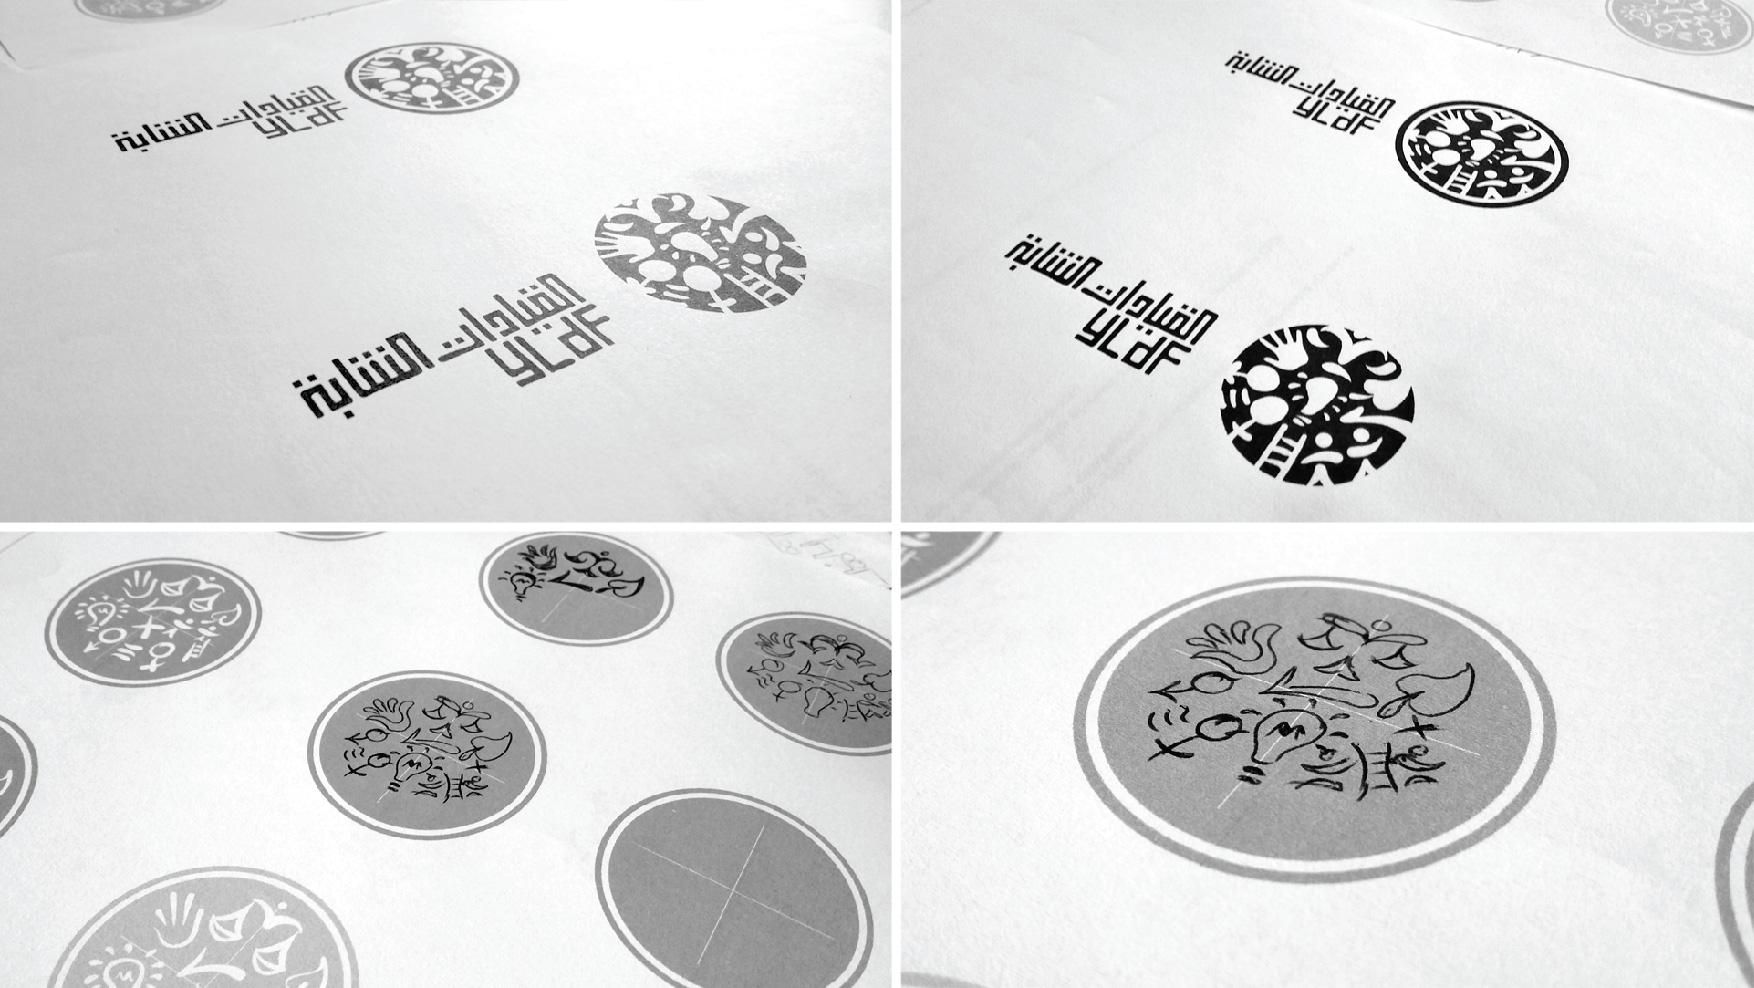 YLDF_ajaber portfolio-03